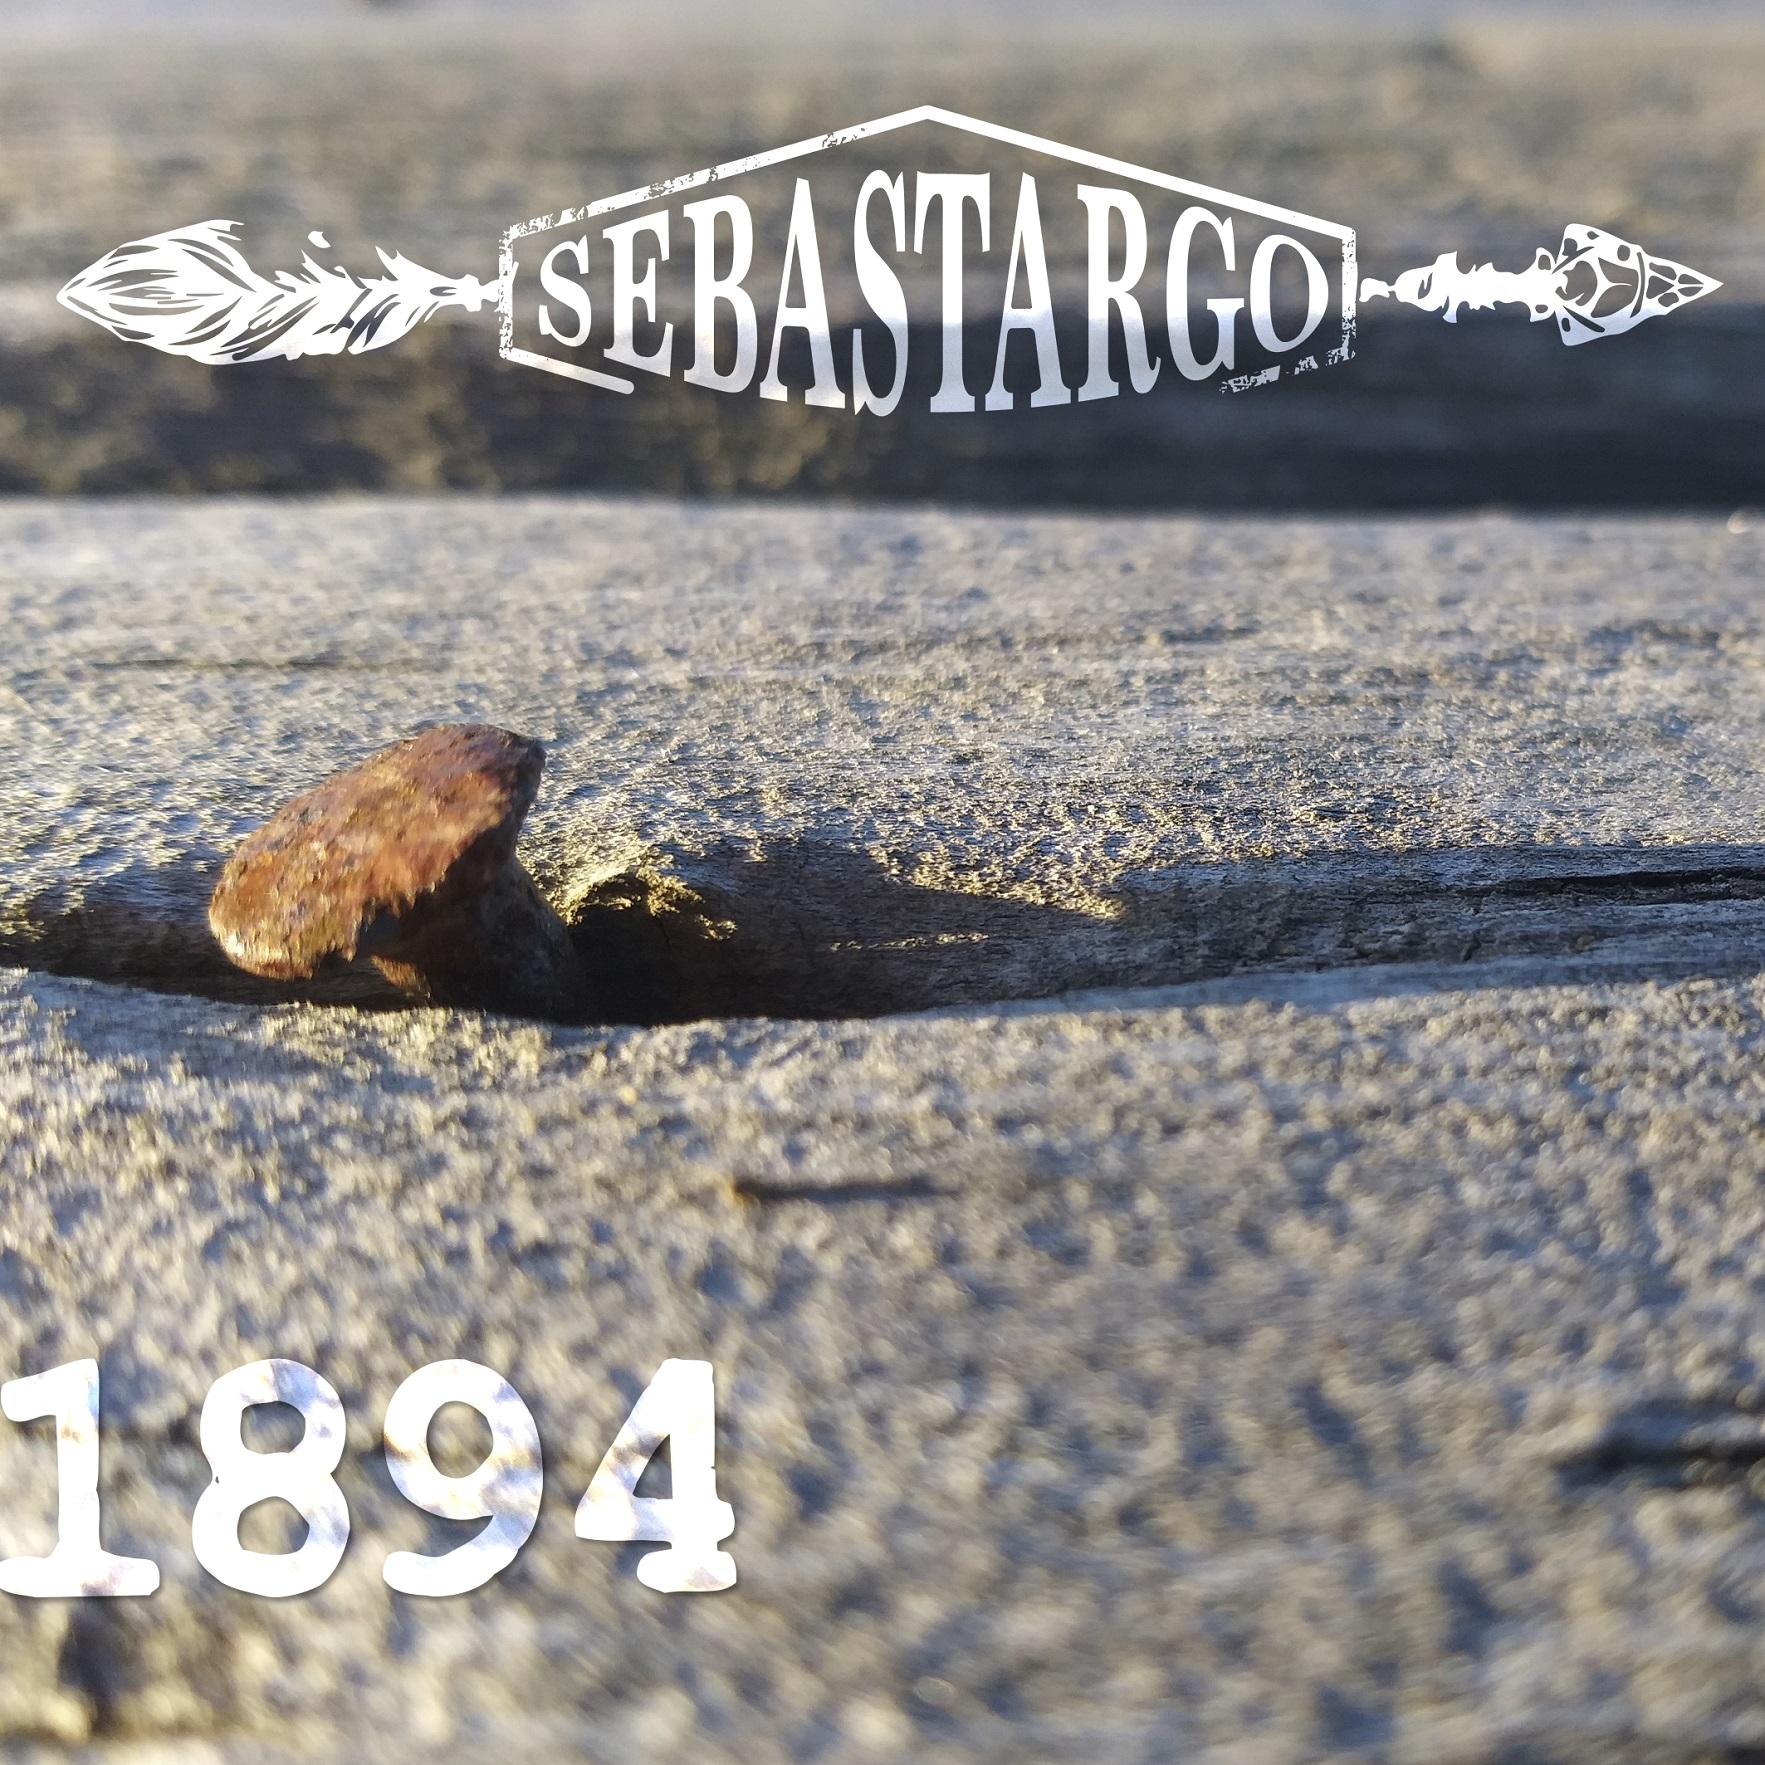 Sebastargo – 1894